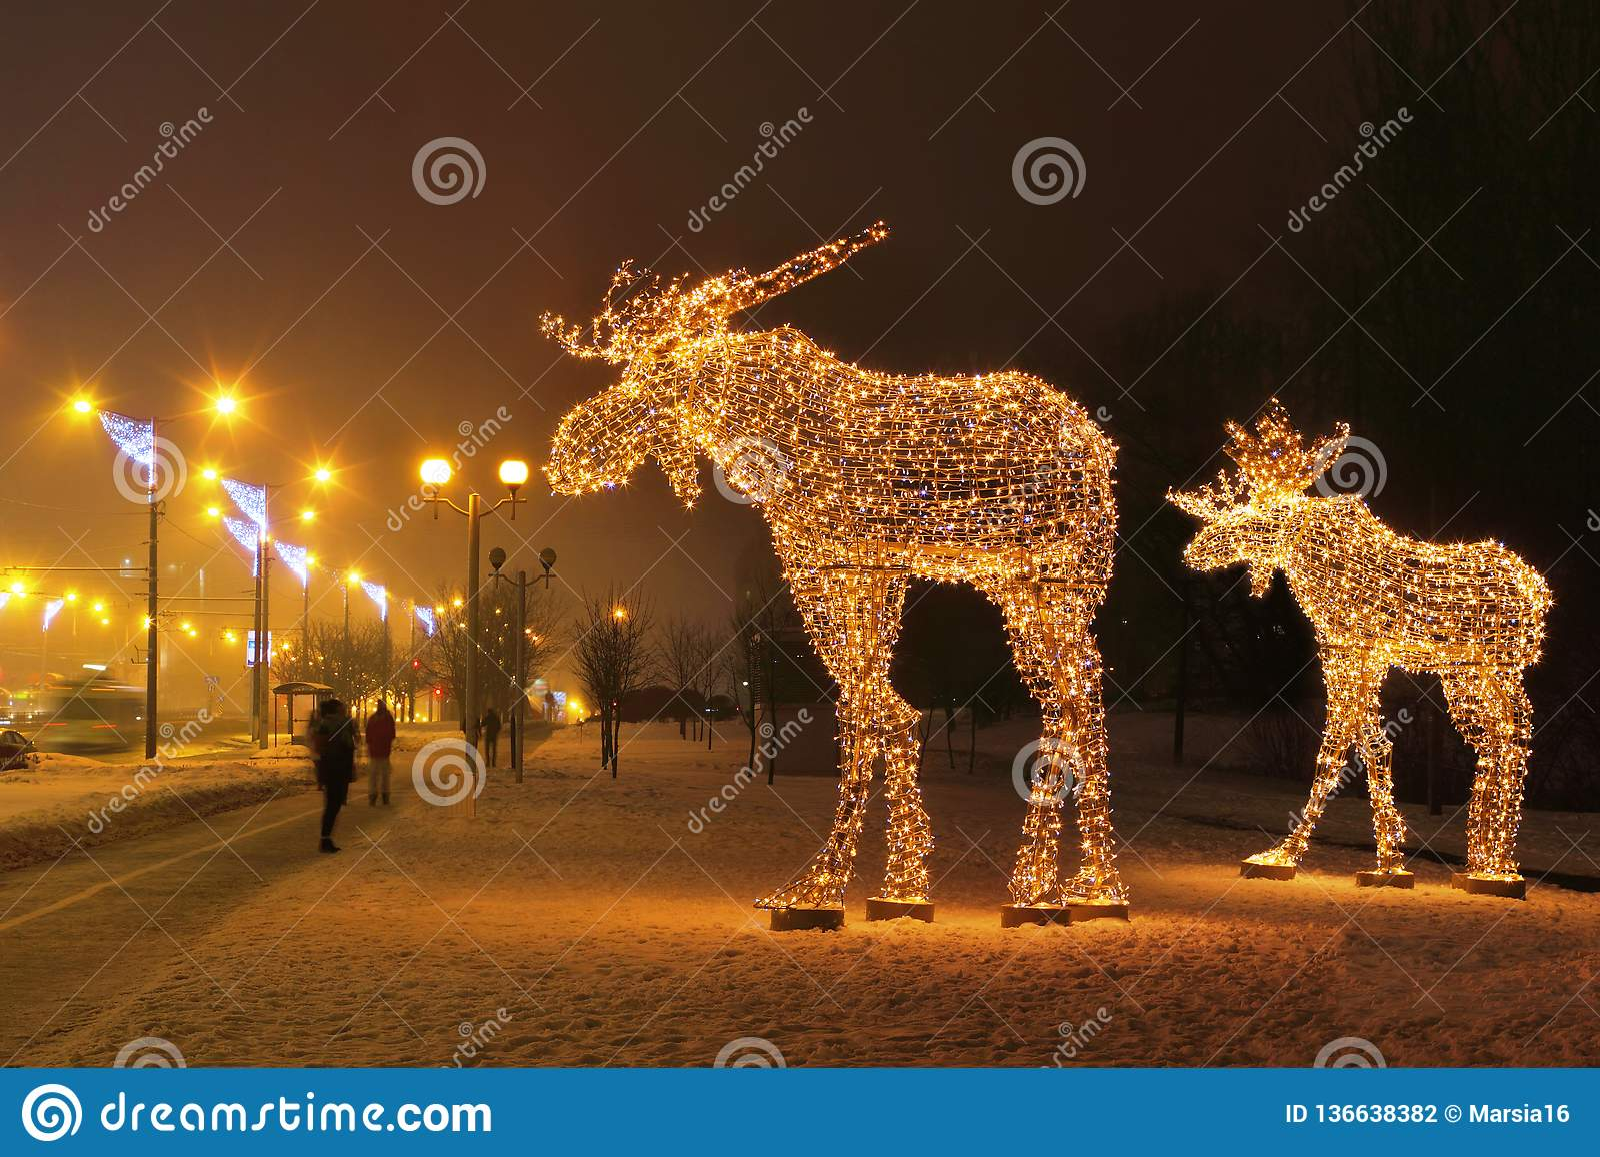 Two Luminous Moose